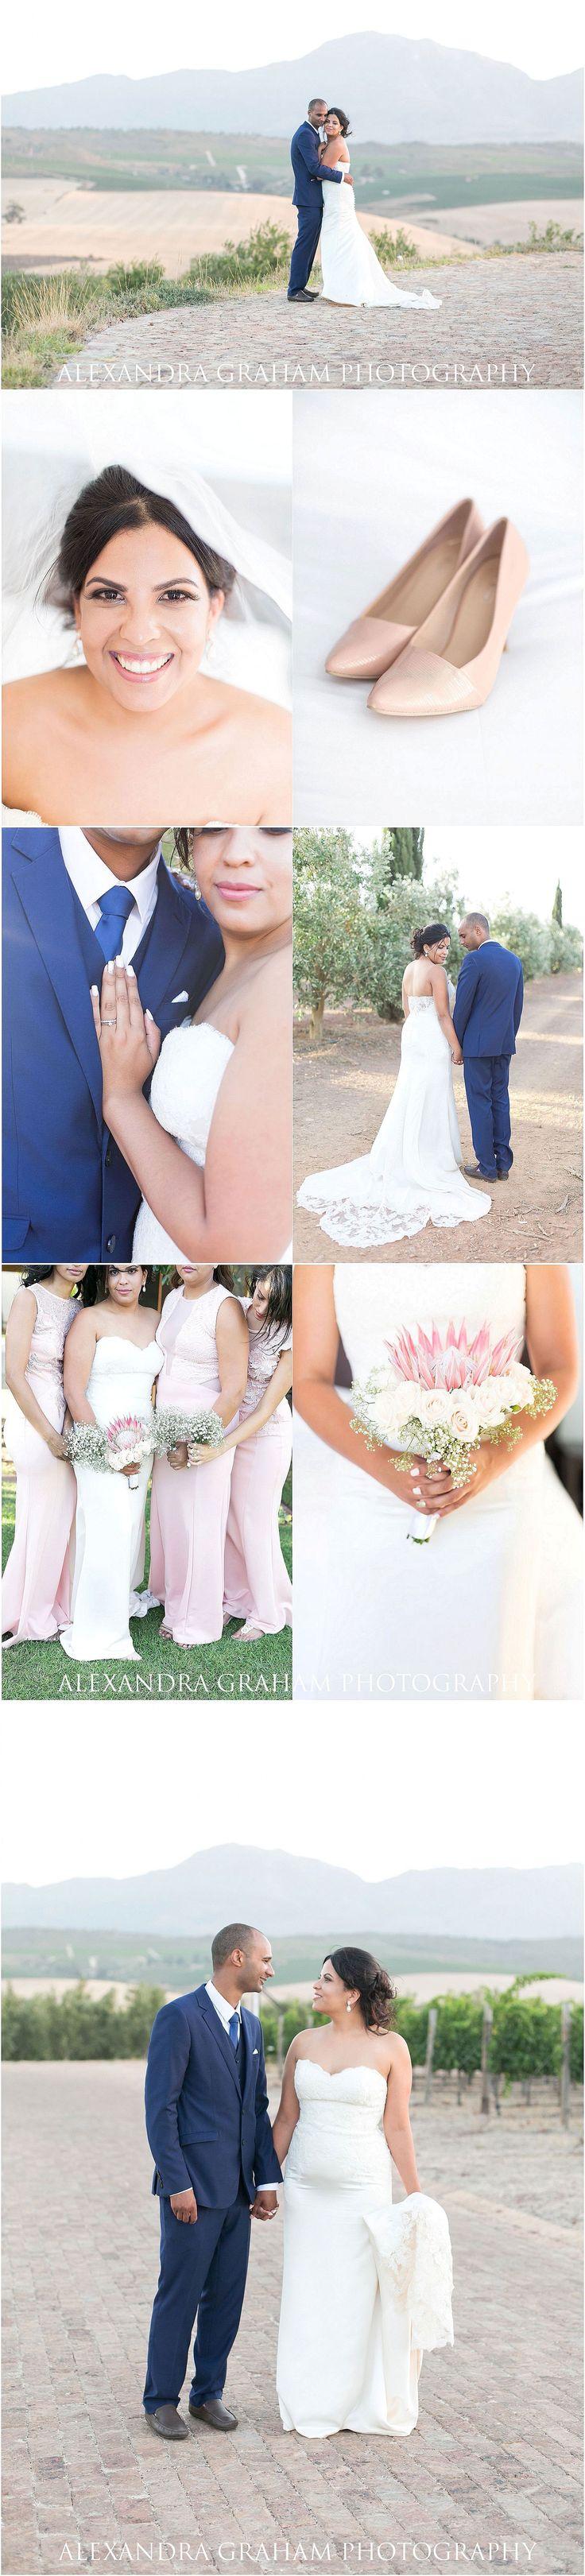 Soft pastel pink wedding - protea and rose bouquet - mountain wedding - Alexandra Graham Photography